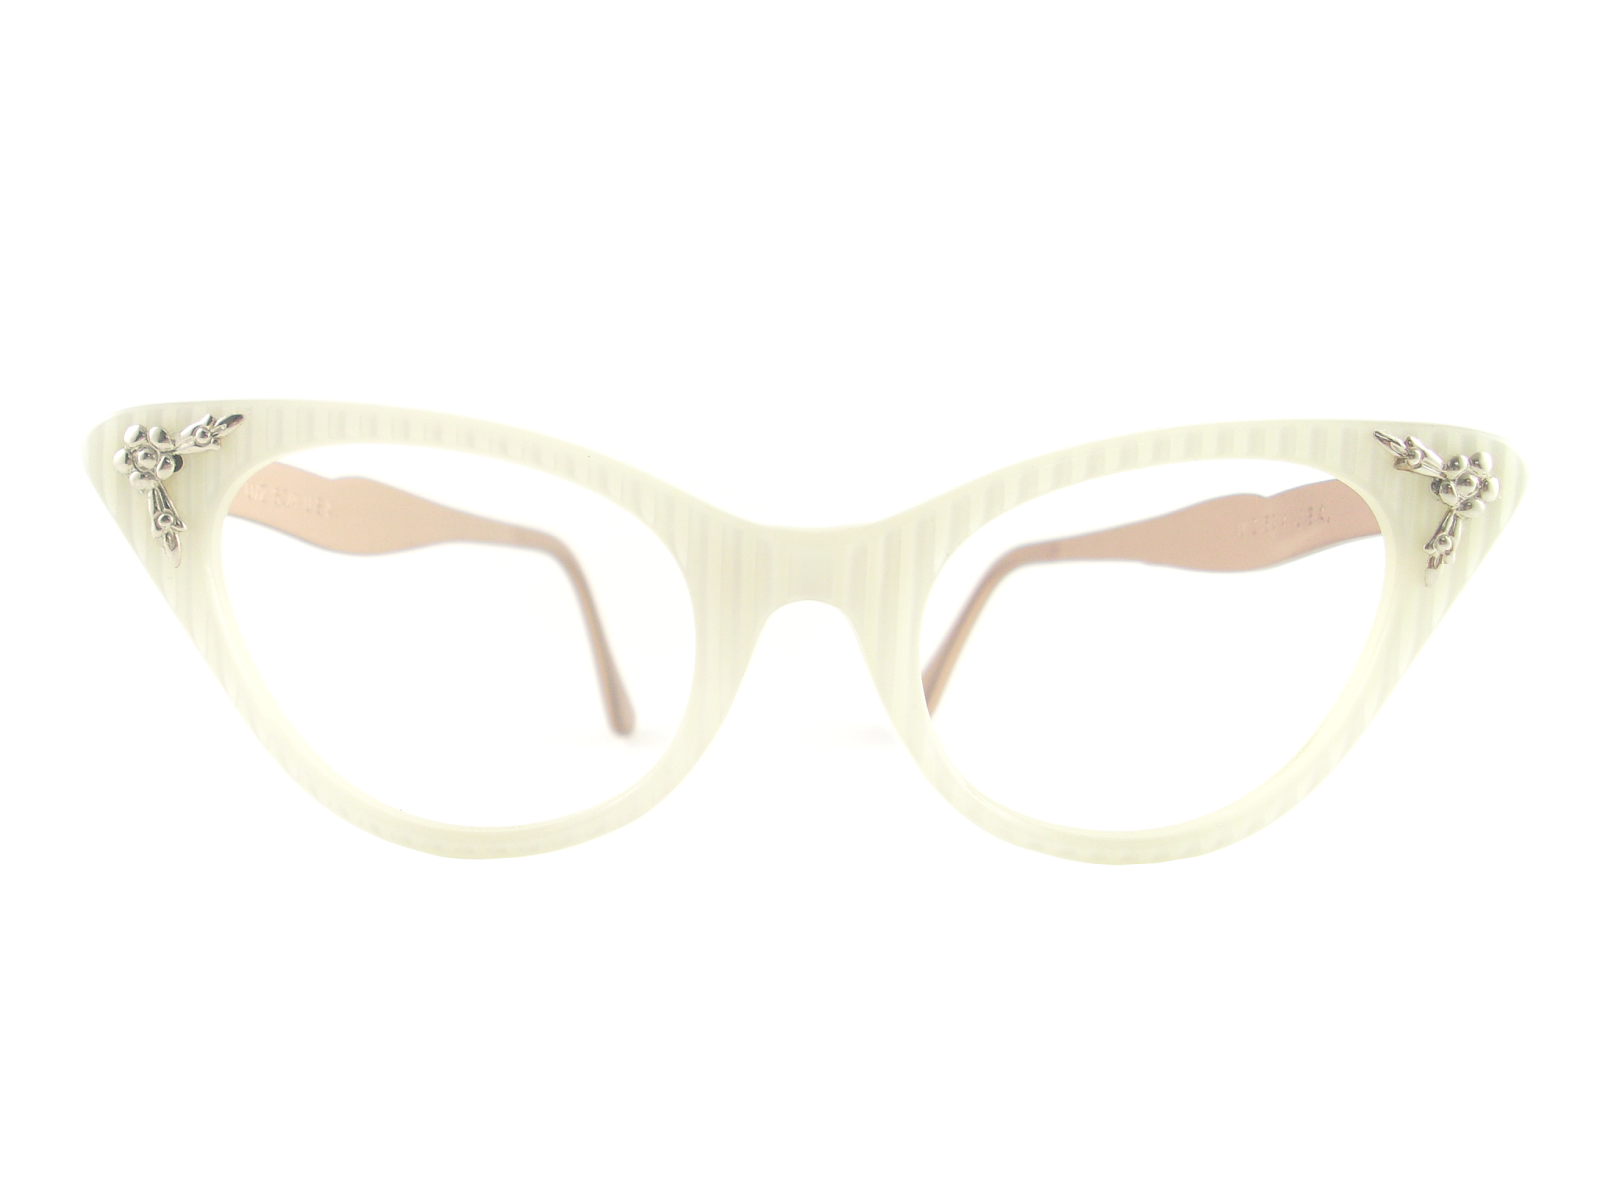 Vintage Eyeglasses Frames Eyewear Sunglasses 50S: October 2014